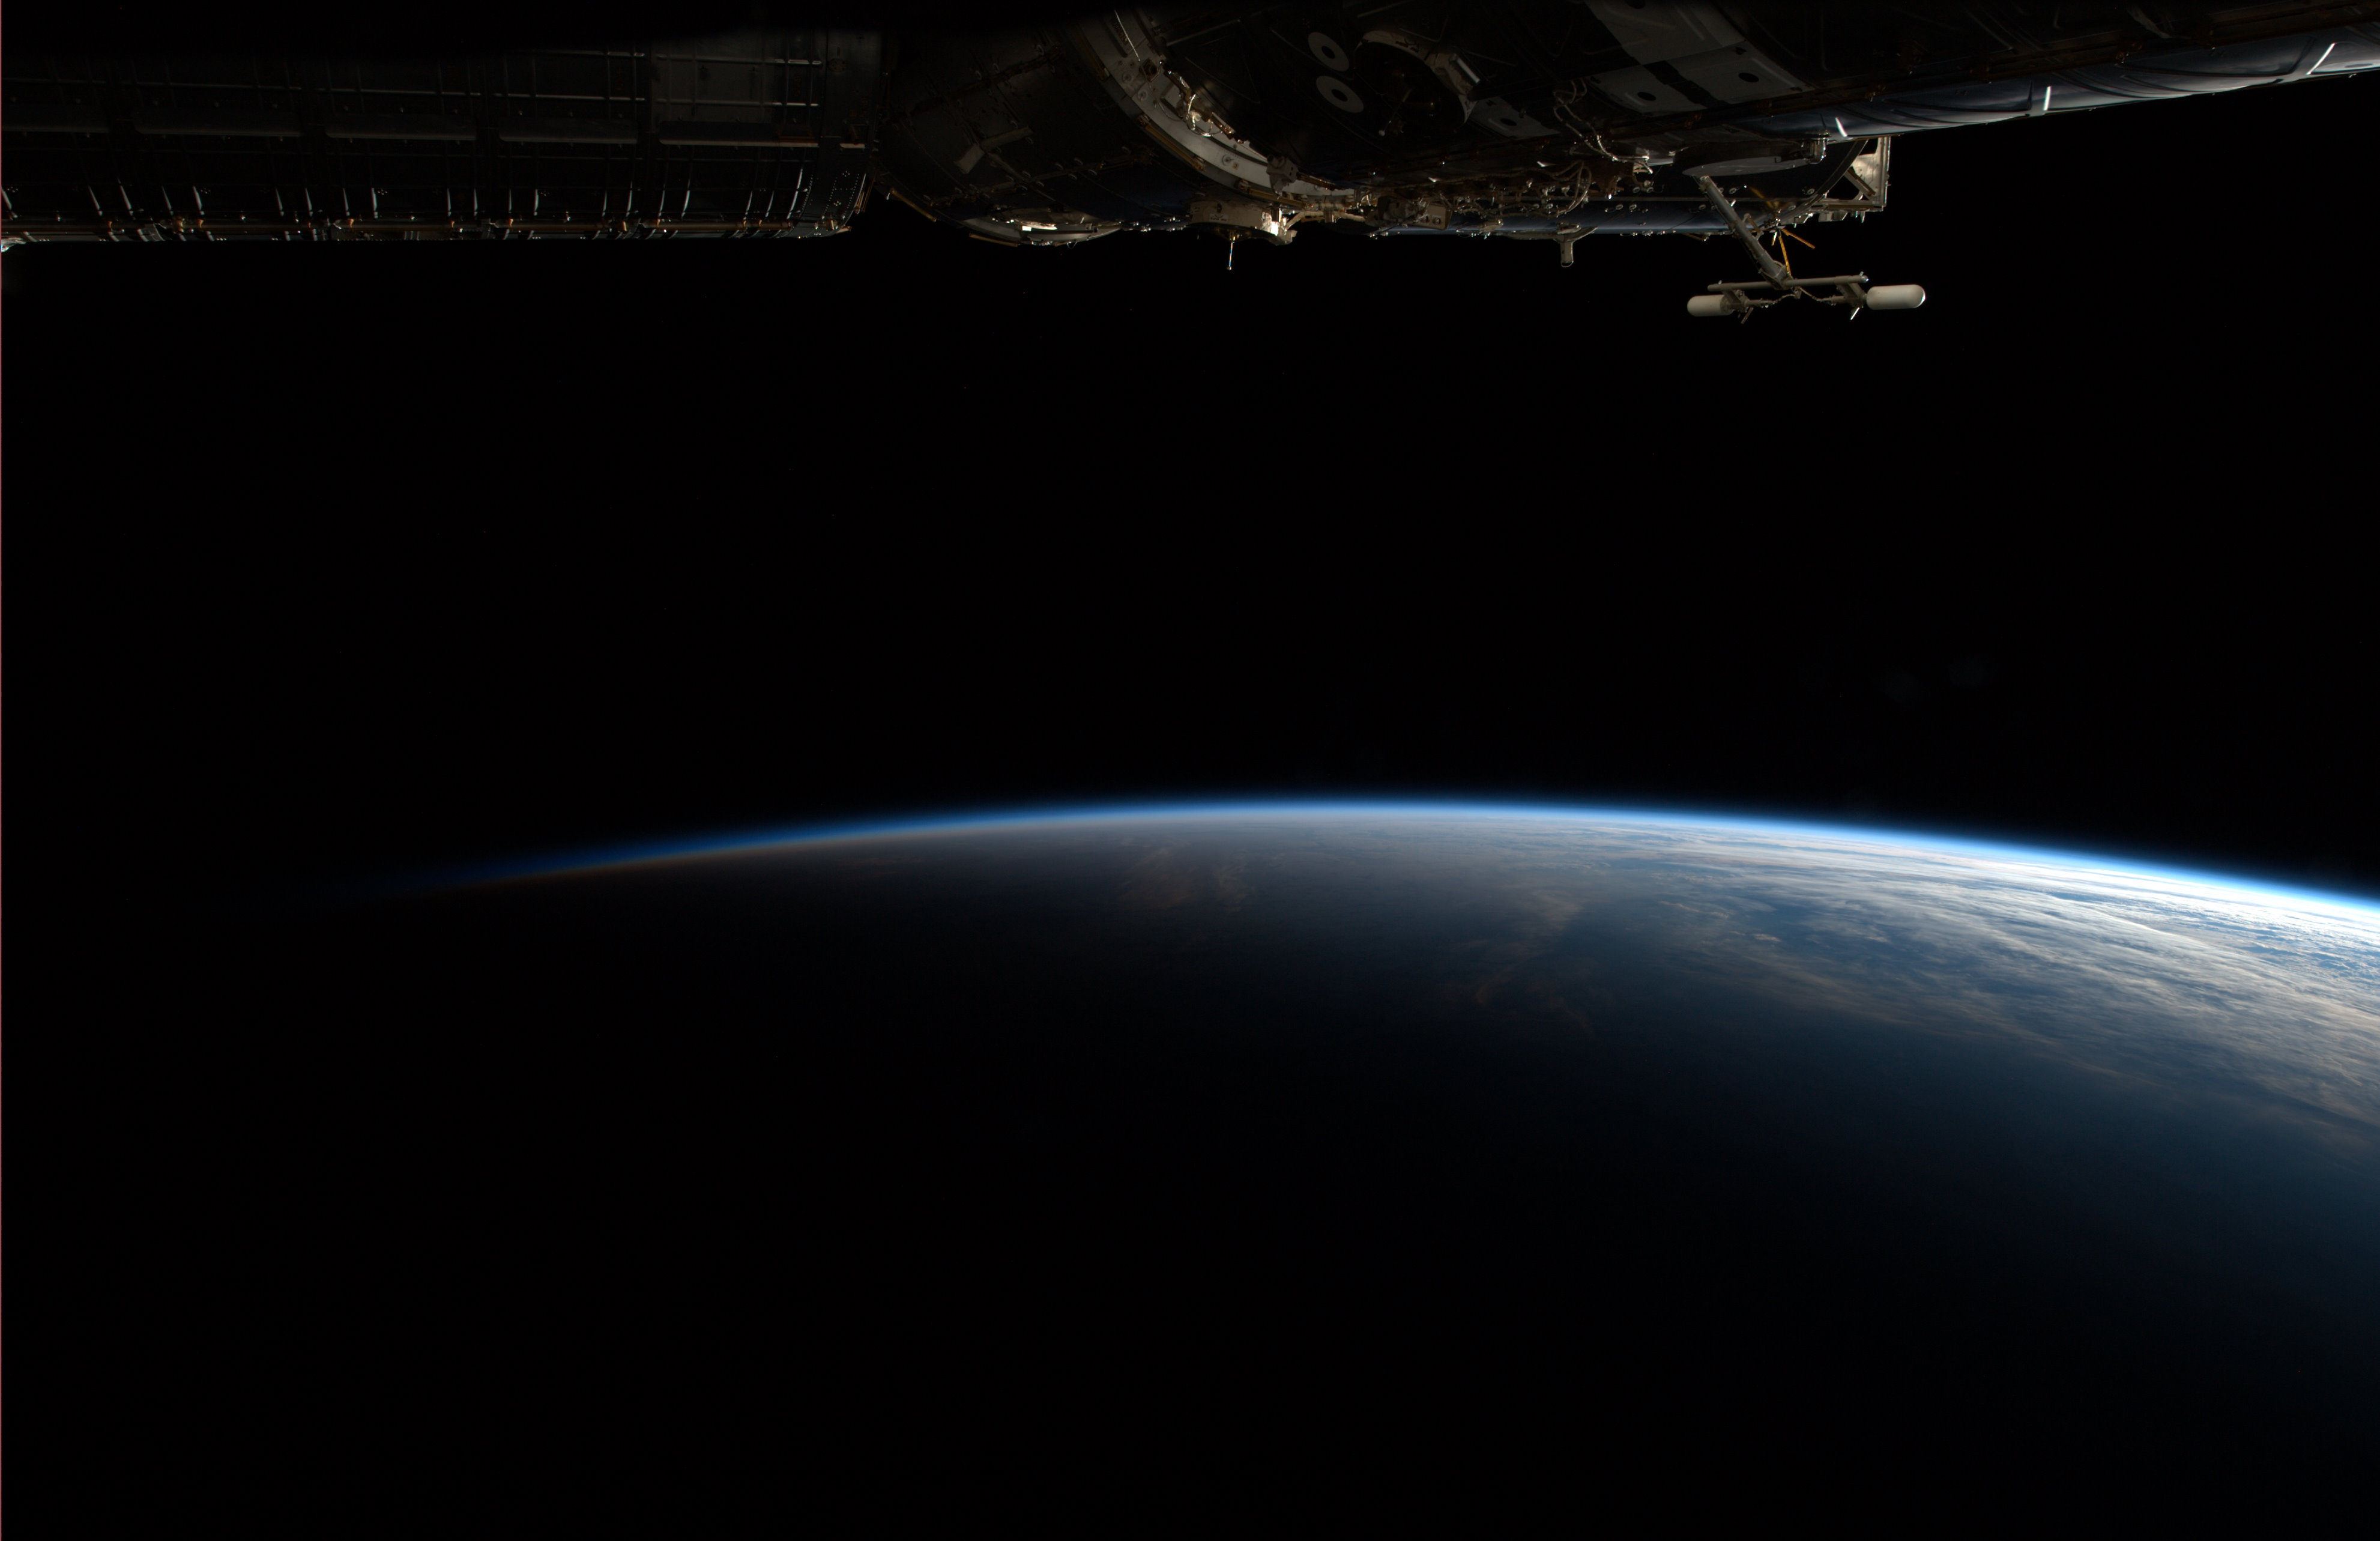 earth horizon nasa night - photo #19